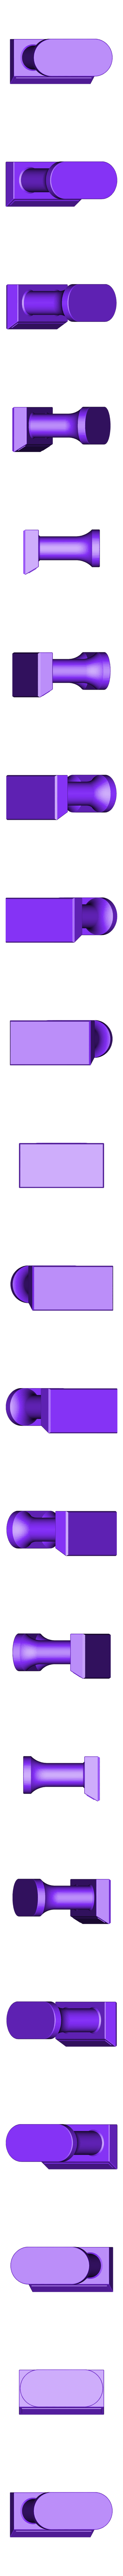 Trophy Double Riser.stl Download free STL file Trophy Double Riser • 3D print template, 3DBuilder